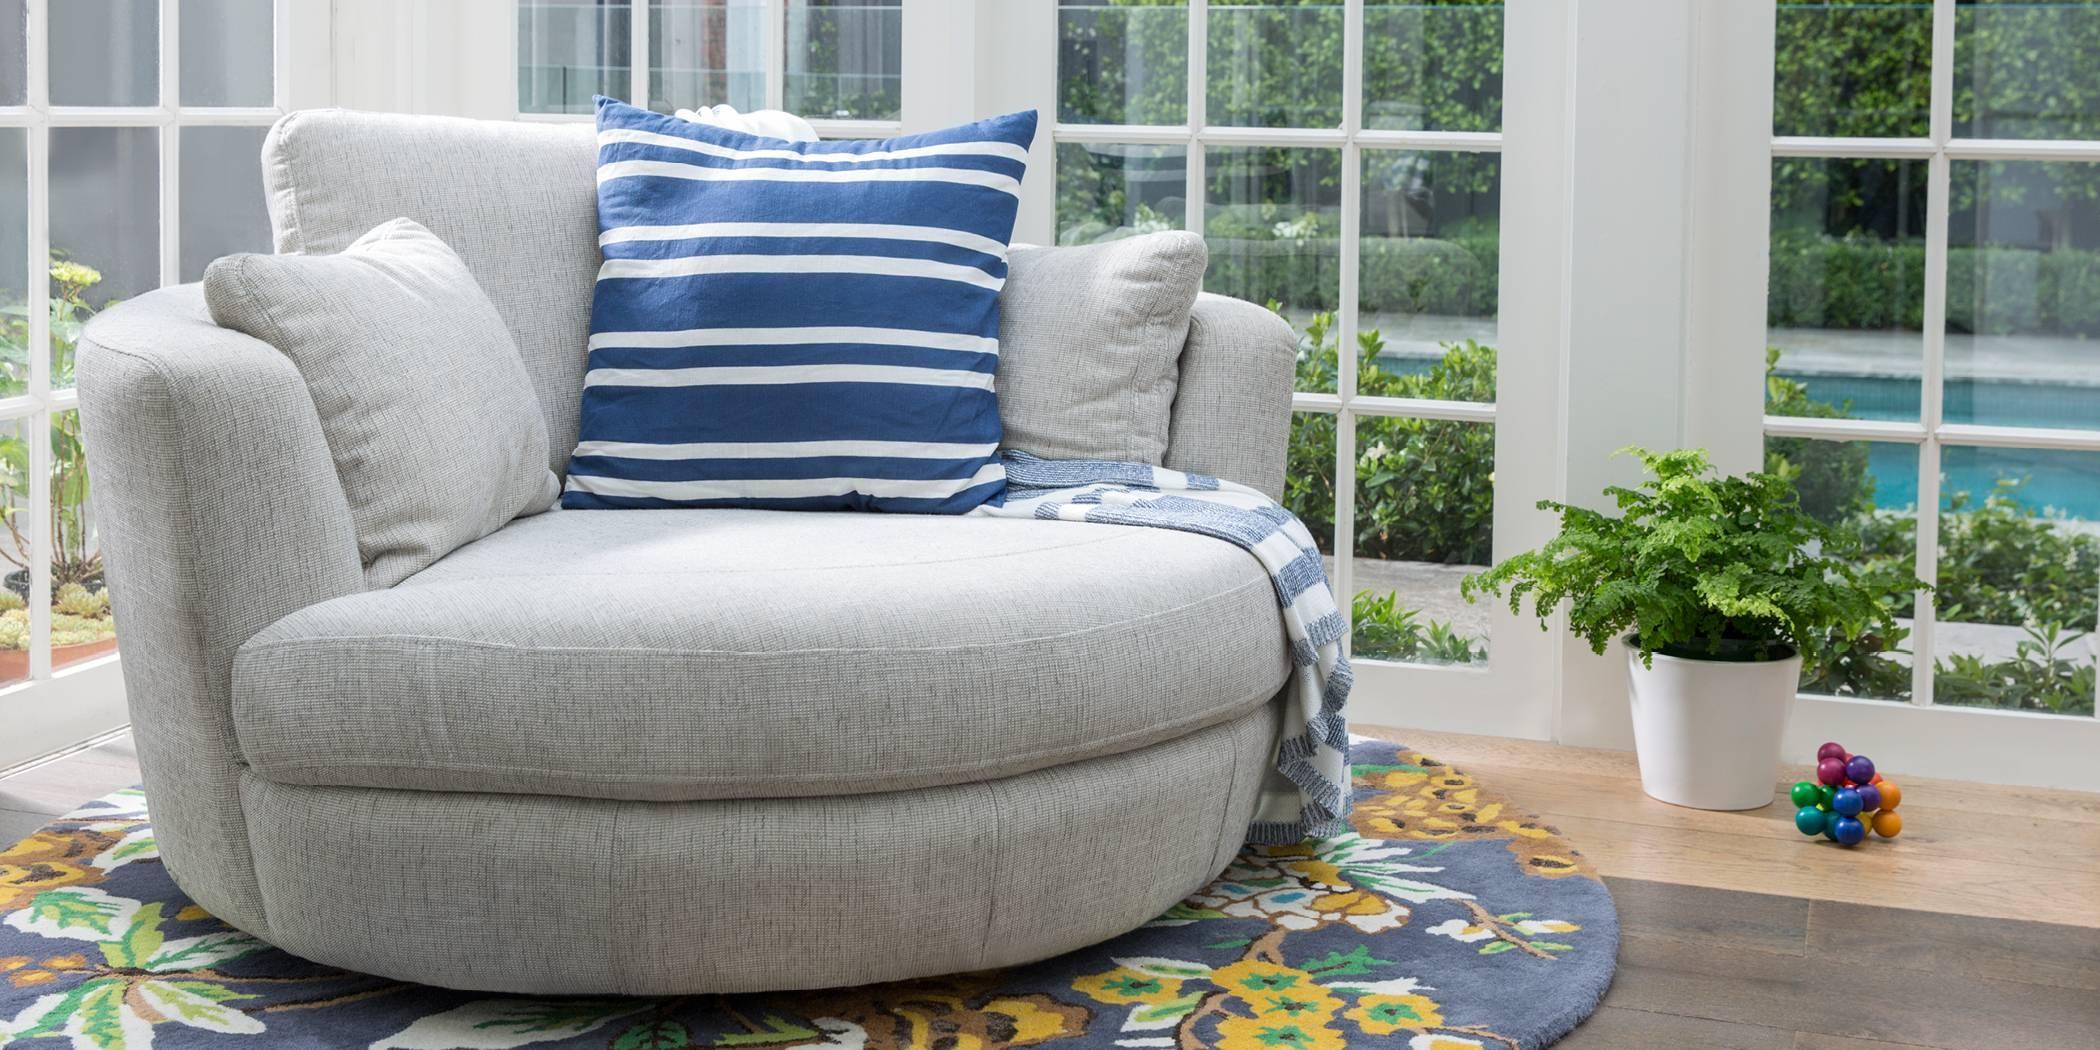 Trendy Round Swivel Sofa Chair L157 Alba Modern Leather Lounge Dsc with Round Swivel Sofa Chairs (Image 28 of 30)